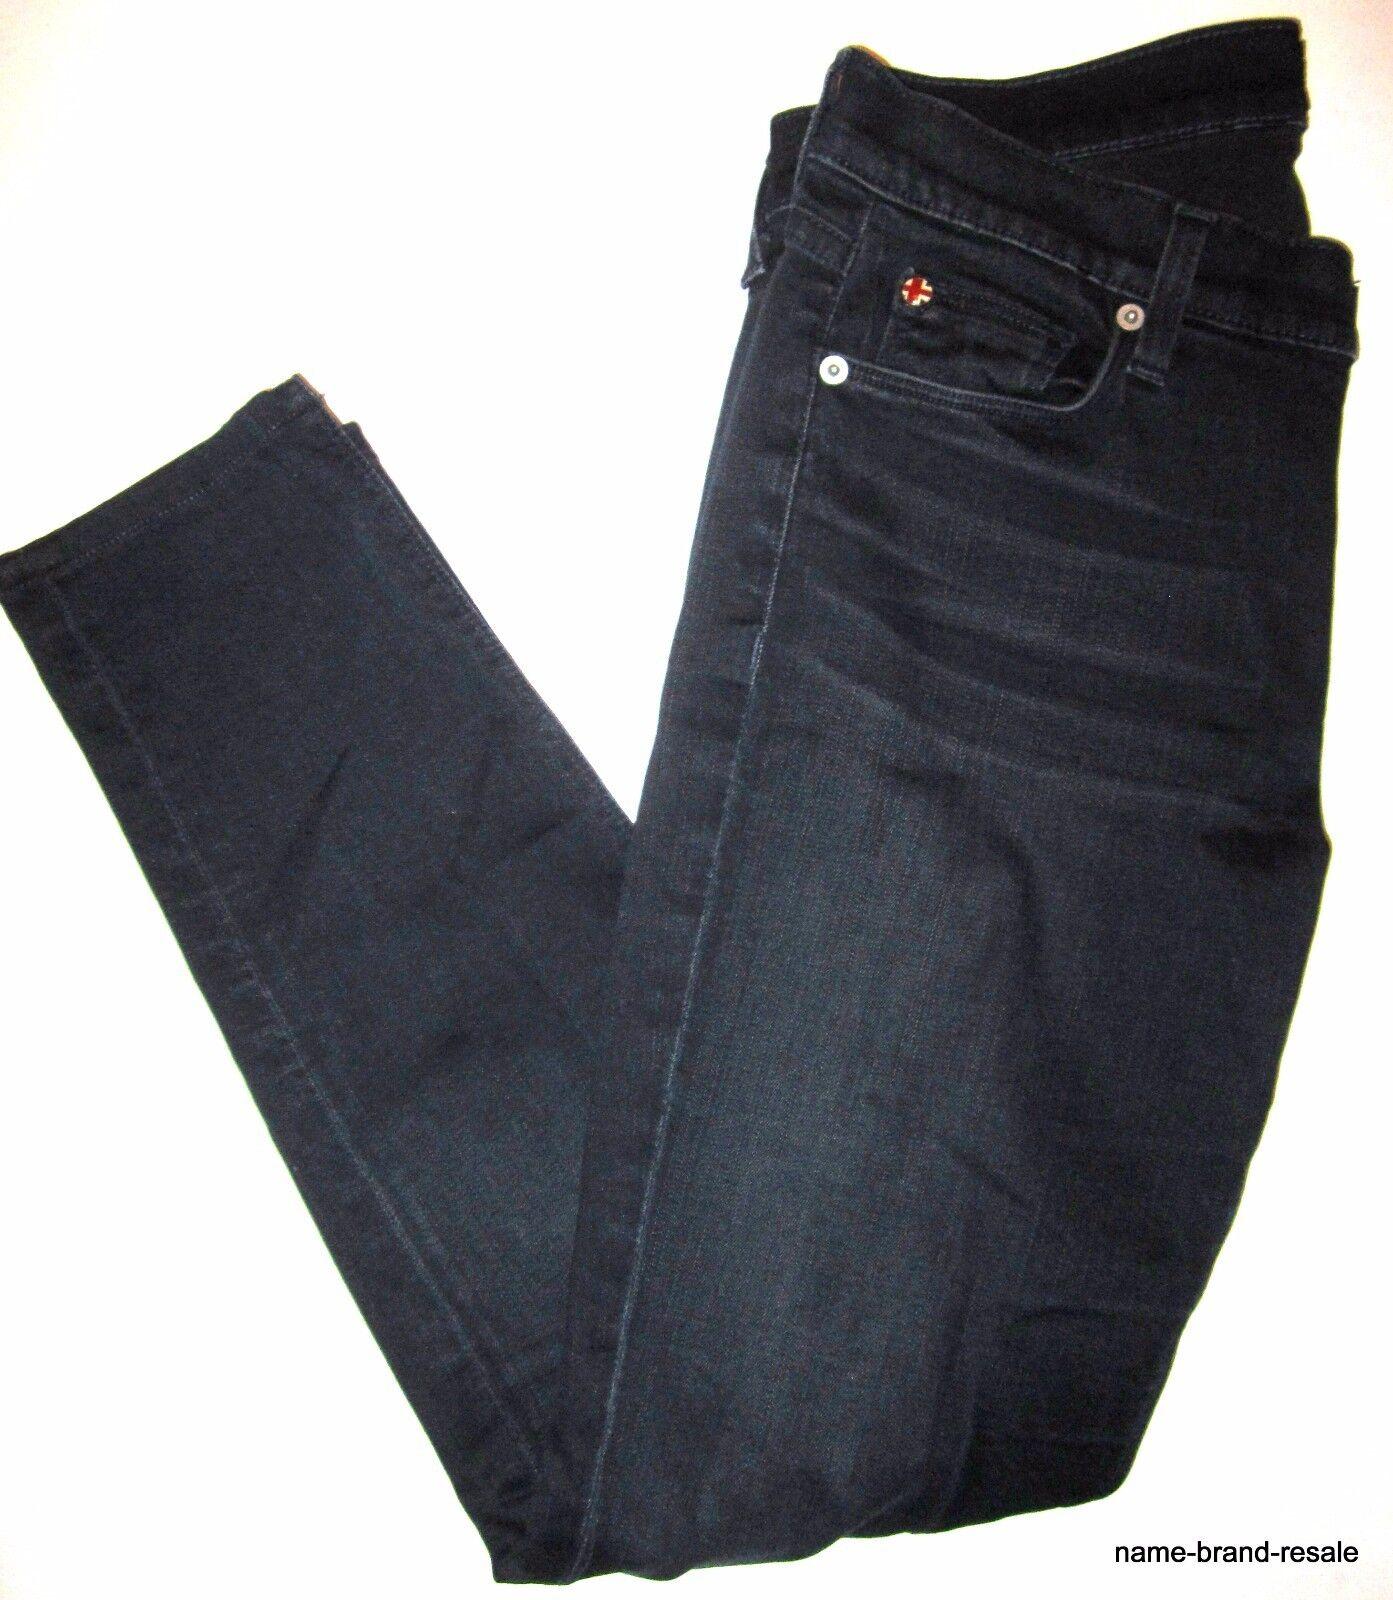 HUDSON Skinny JEANS damen 28 Dark Indigo Faded Wash SLIM Leg Designer Denim